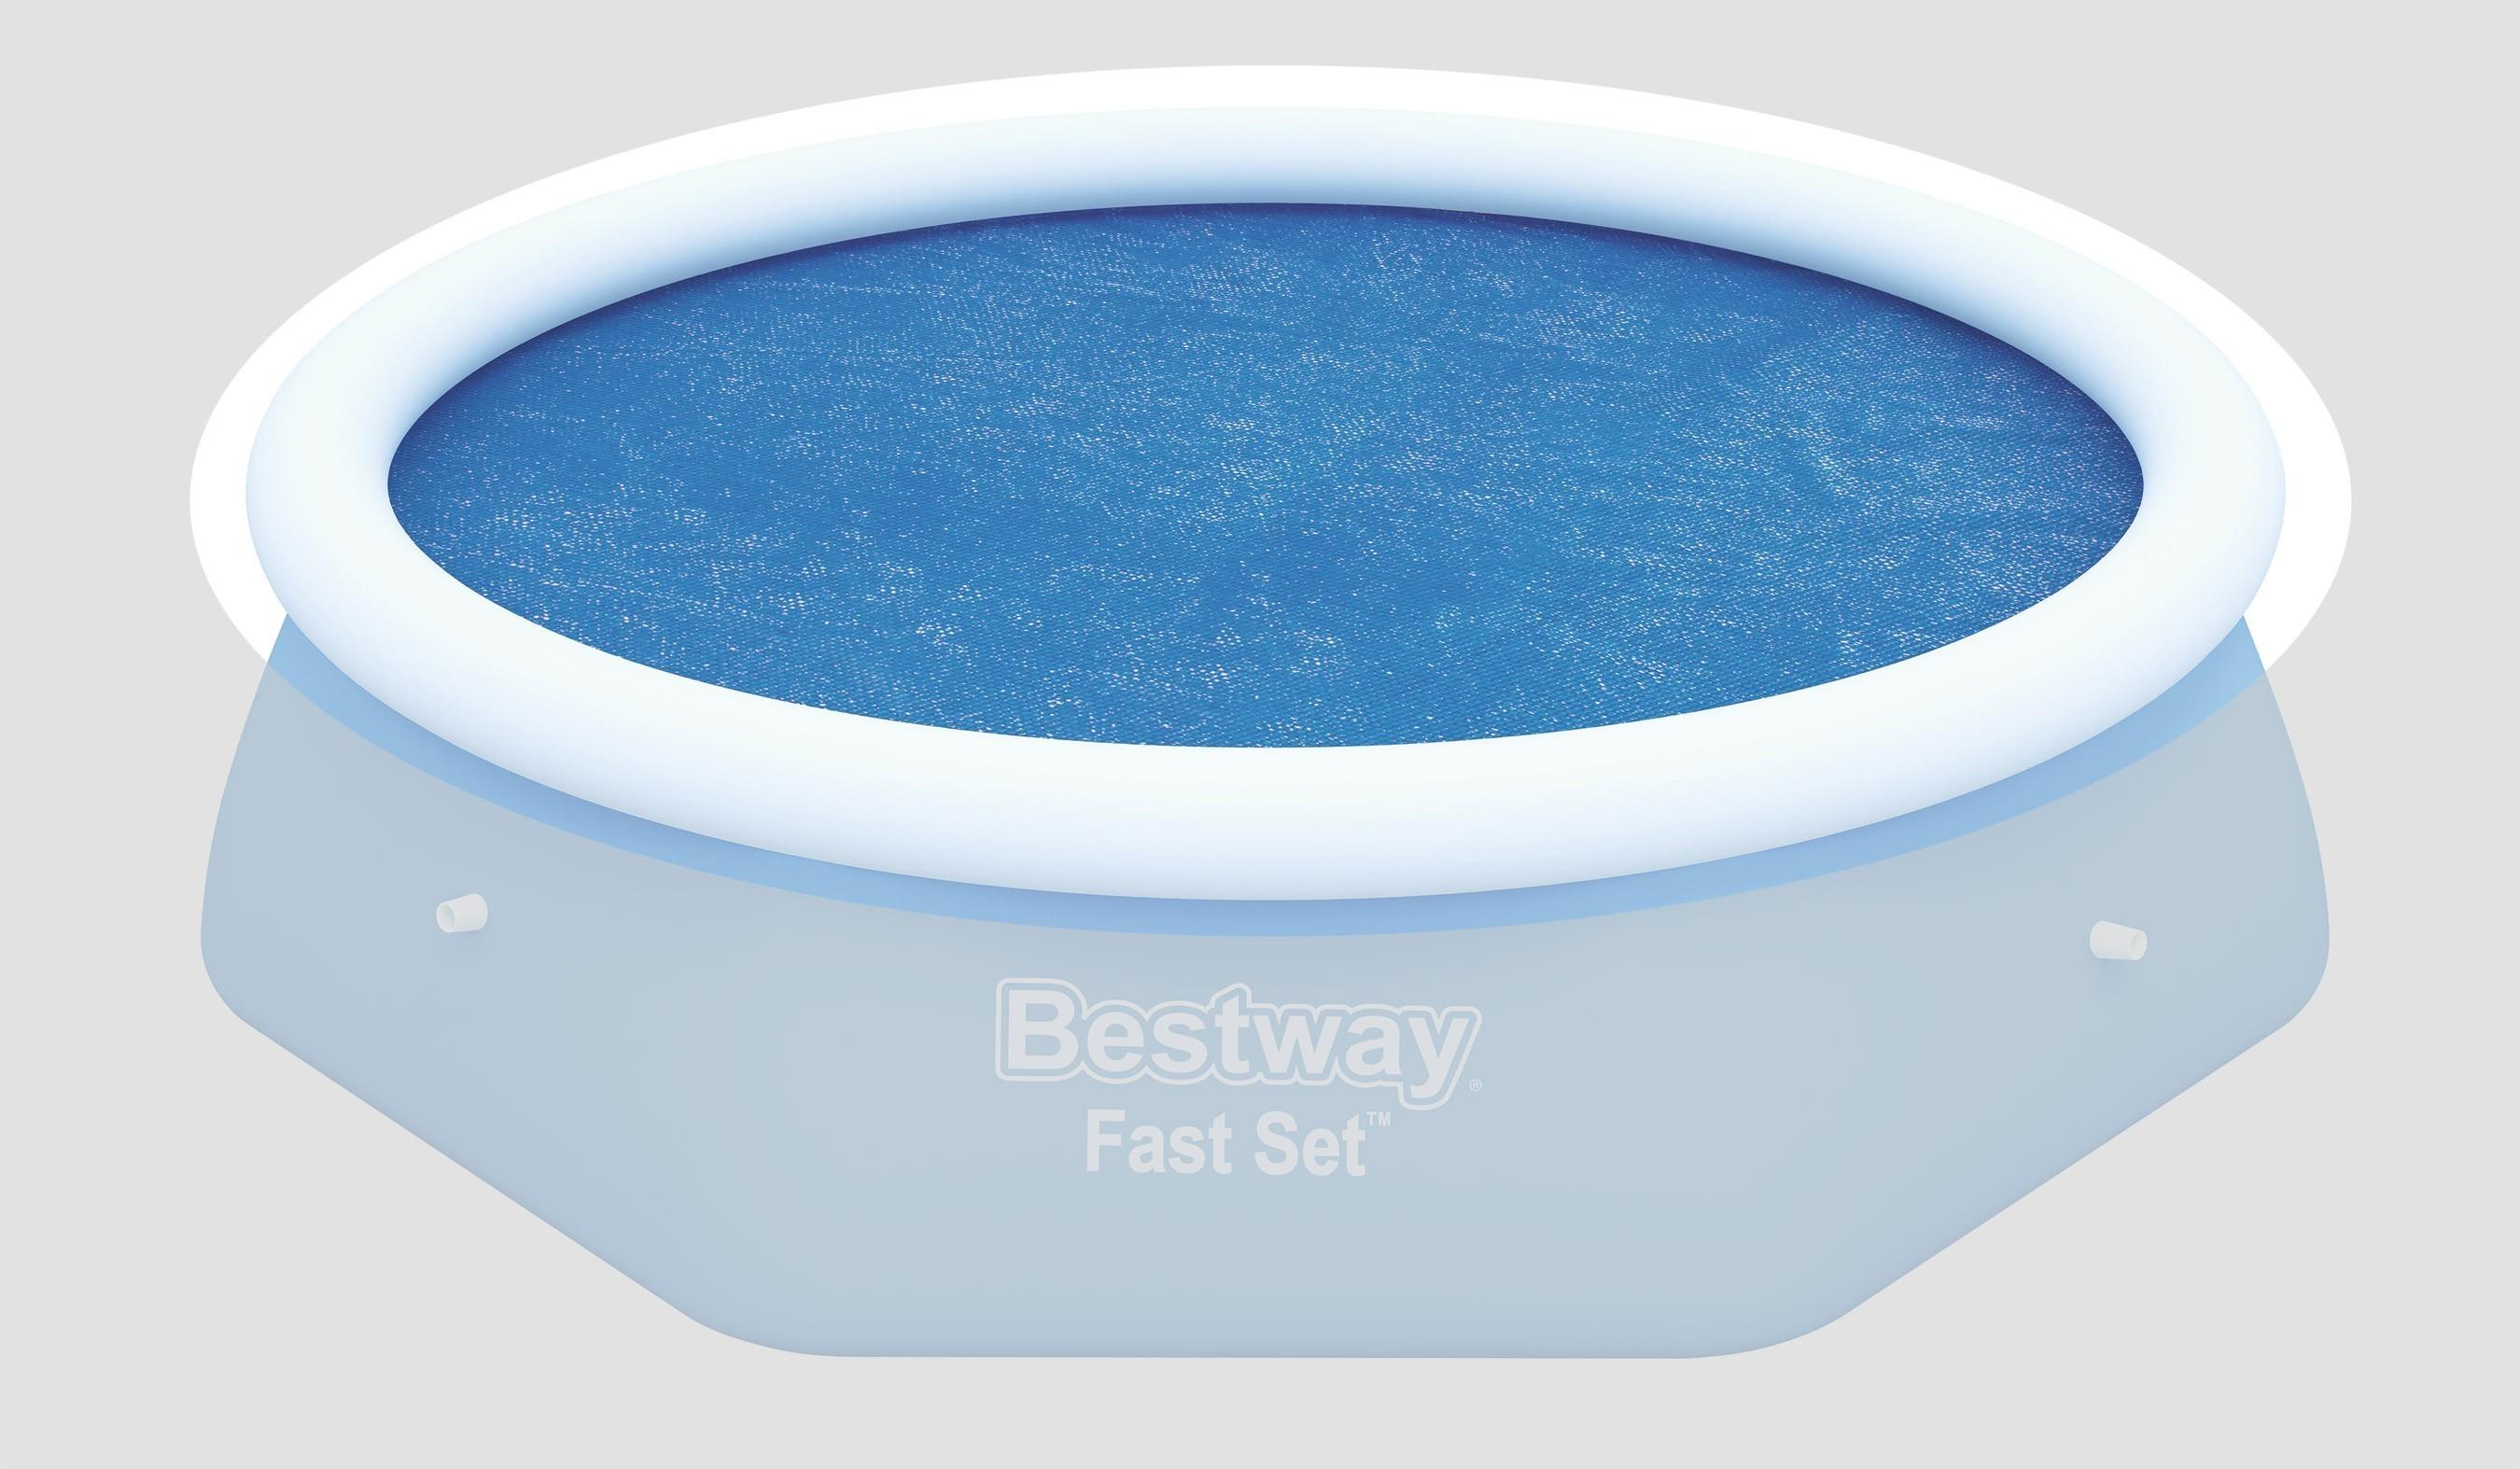 Poolabdeckung / Pool Solarabdeckplane Bestway Fast Set Pool Ø 244cm Bild 1